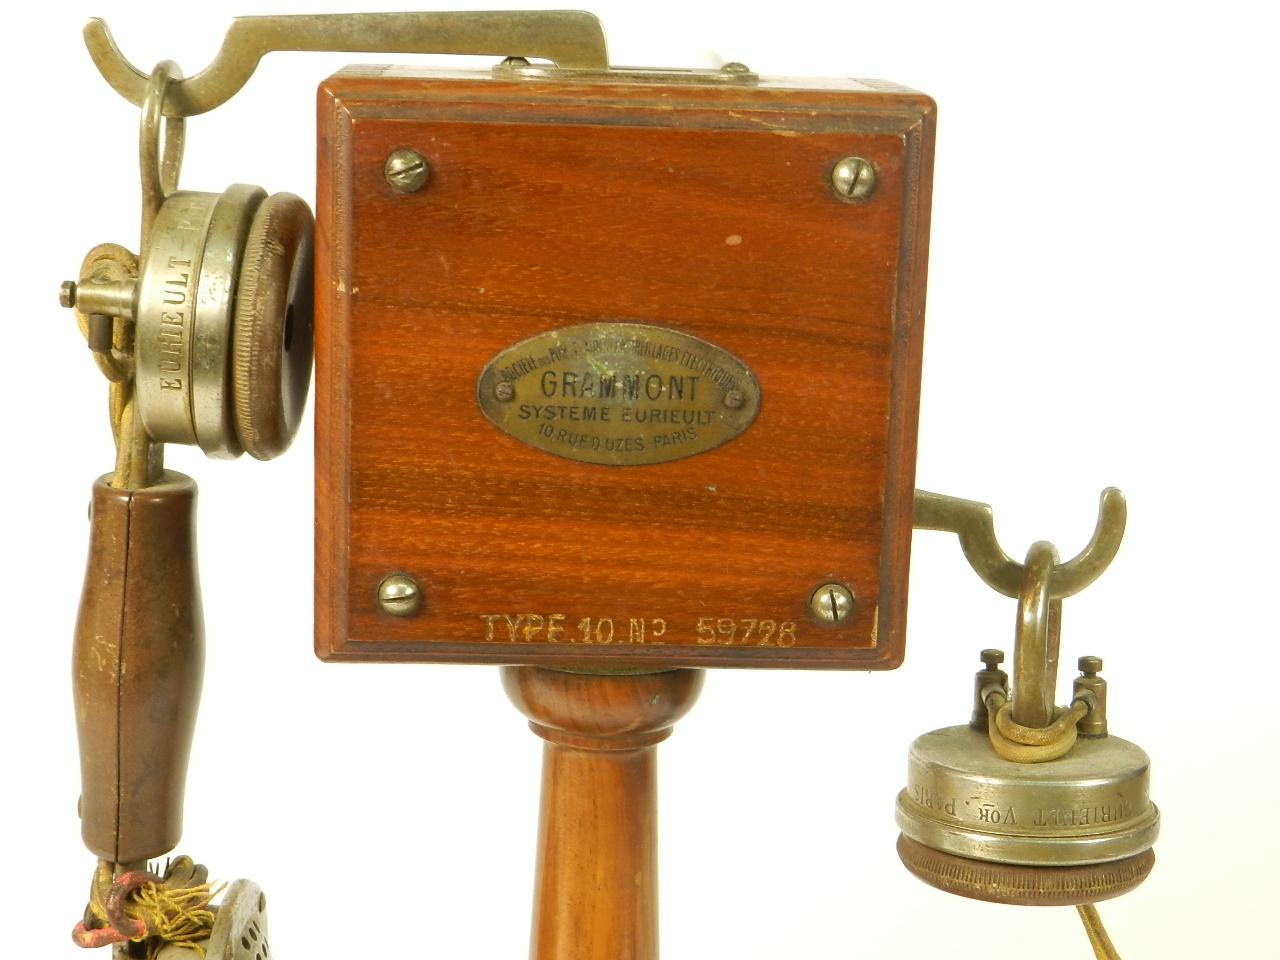 Imagen TELEFONO GRAMMONT TYPE Nº10 1915 38745